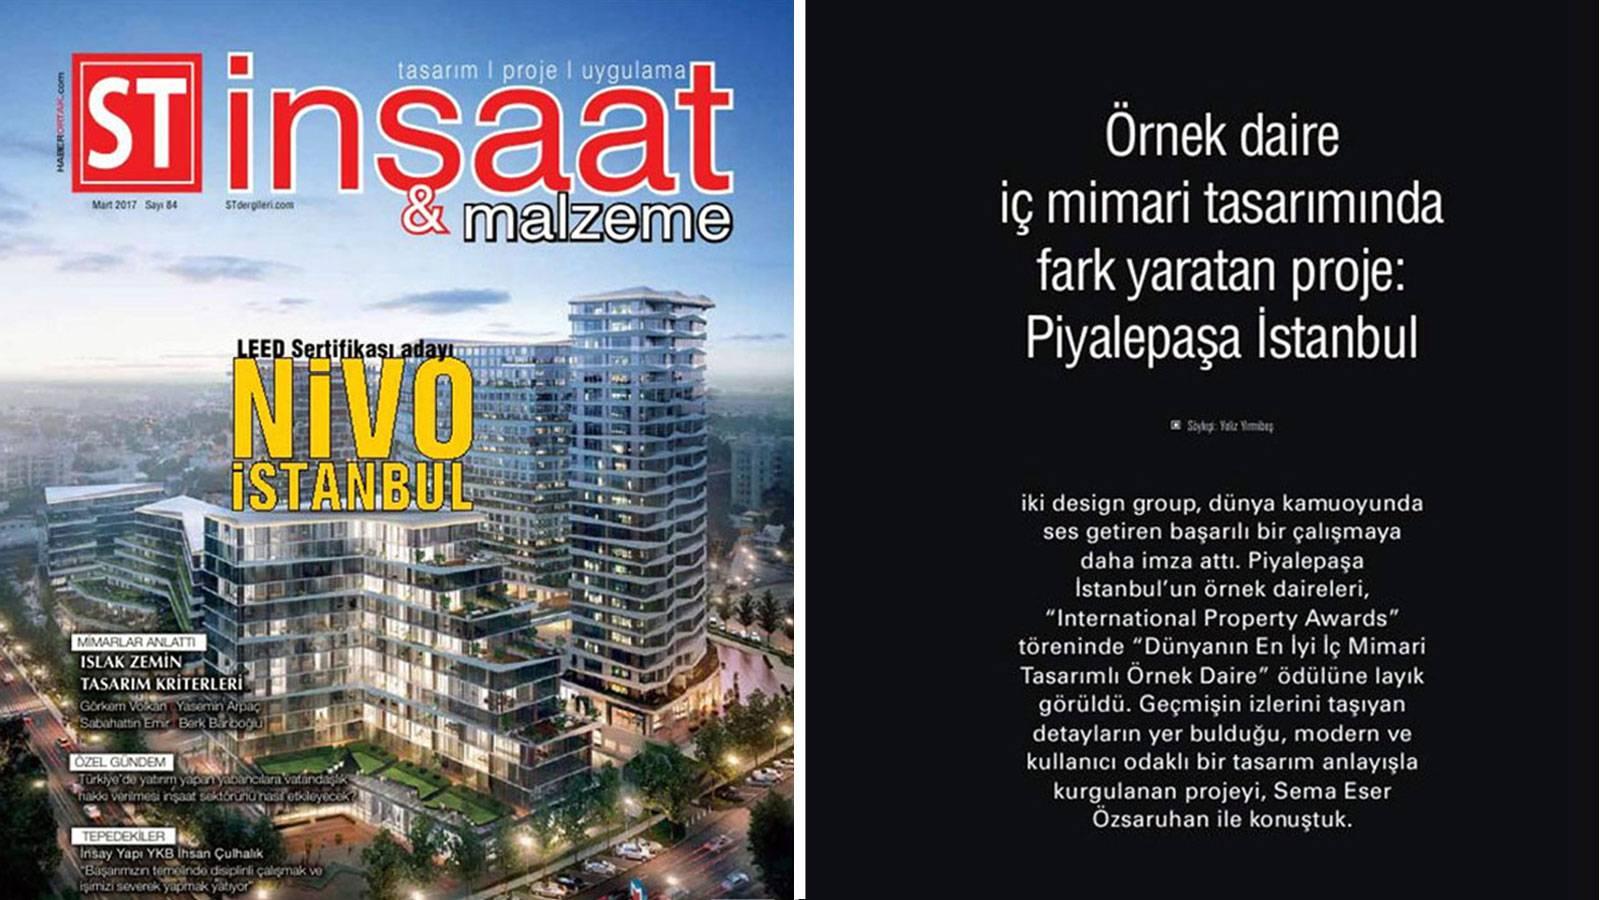 S.T. İnşaat ve Malzeme Magazine's March edition host Sema Eser Özsaruhan.